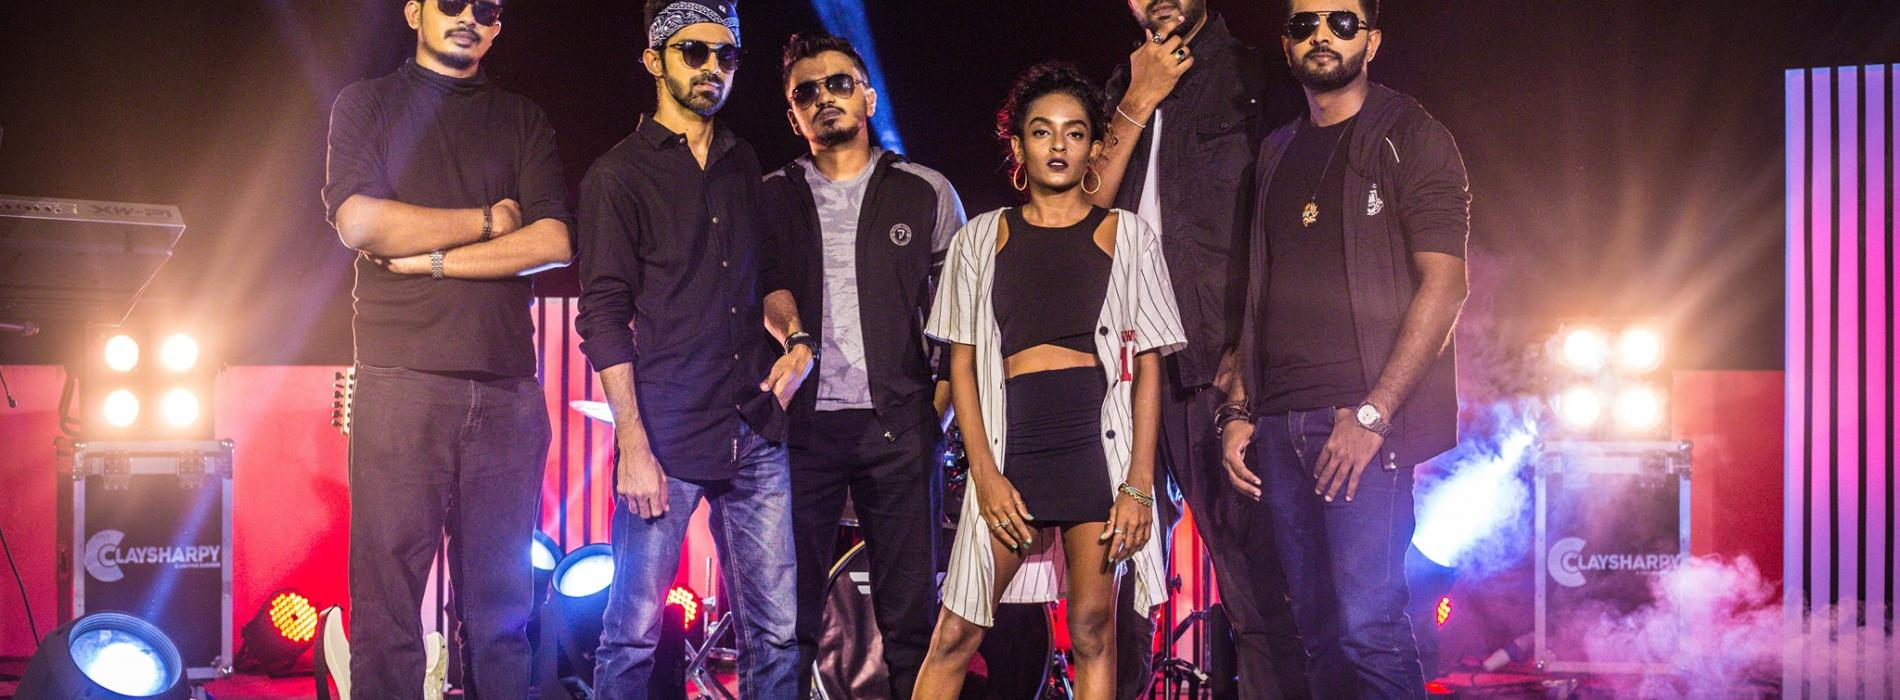 New Music : Charitha Attalage Medley – Dura Akahe   Heena Maka   Sonduru Siththam – WINGS